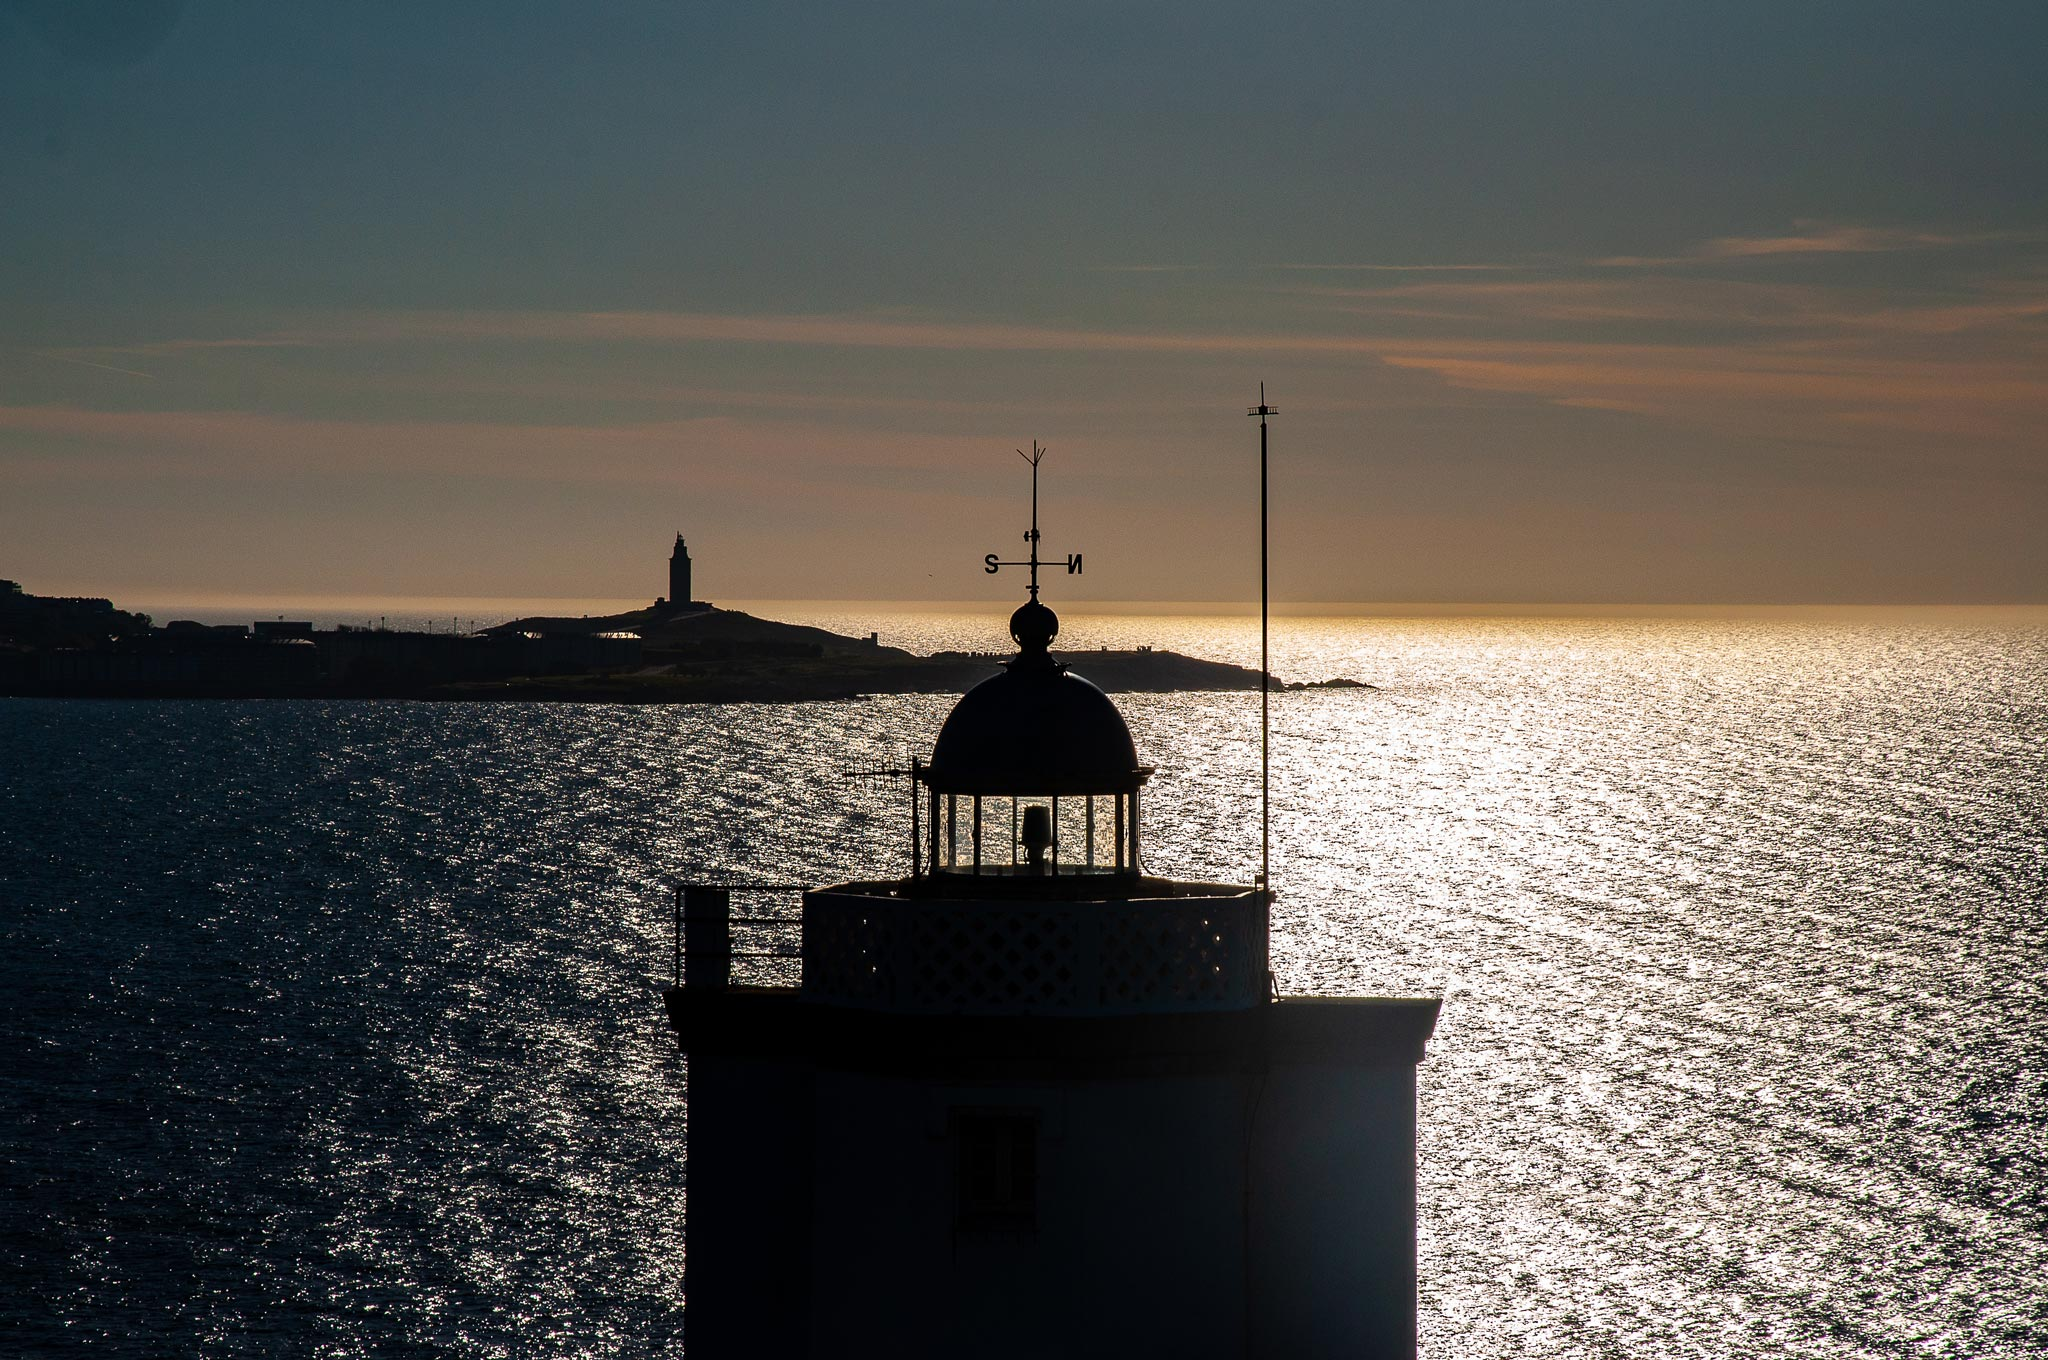 ¿Qué Estás Escuchando? - Página 2 11-Oleiros-Faro-Mera-Torre-hercules-Ruta-Faros-Galicia